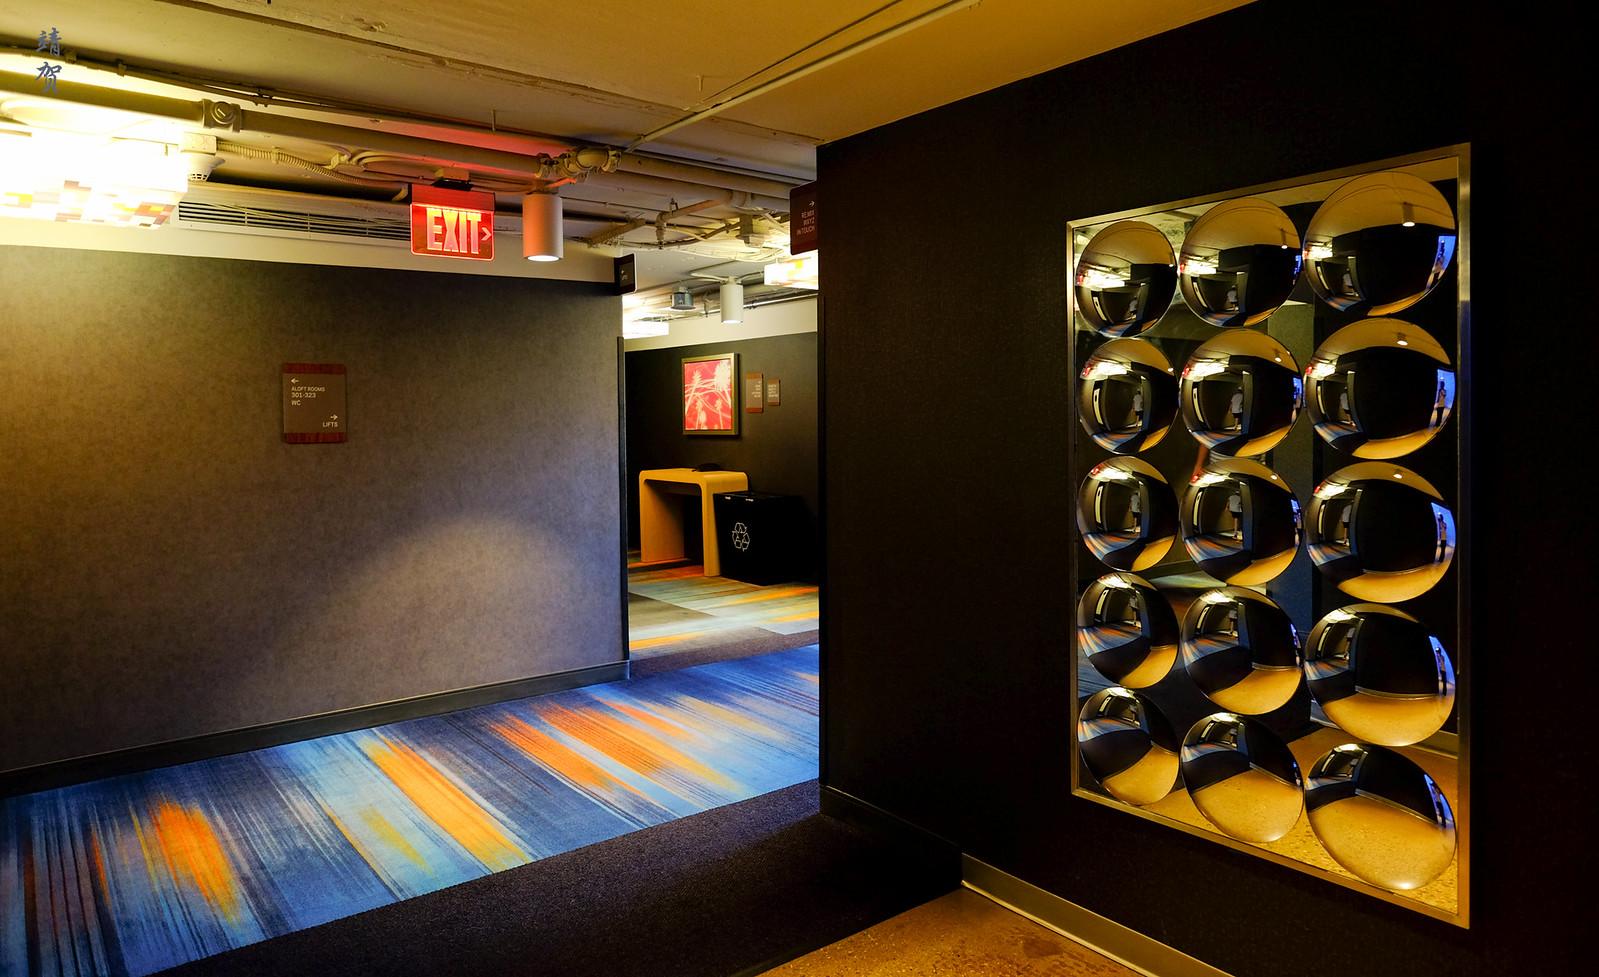 Elevator lobby space